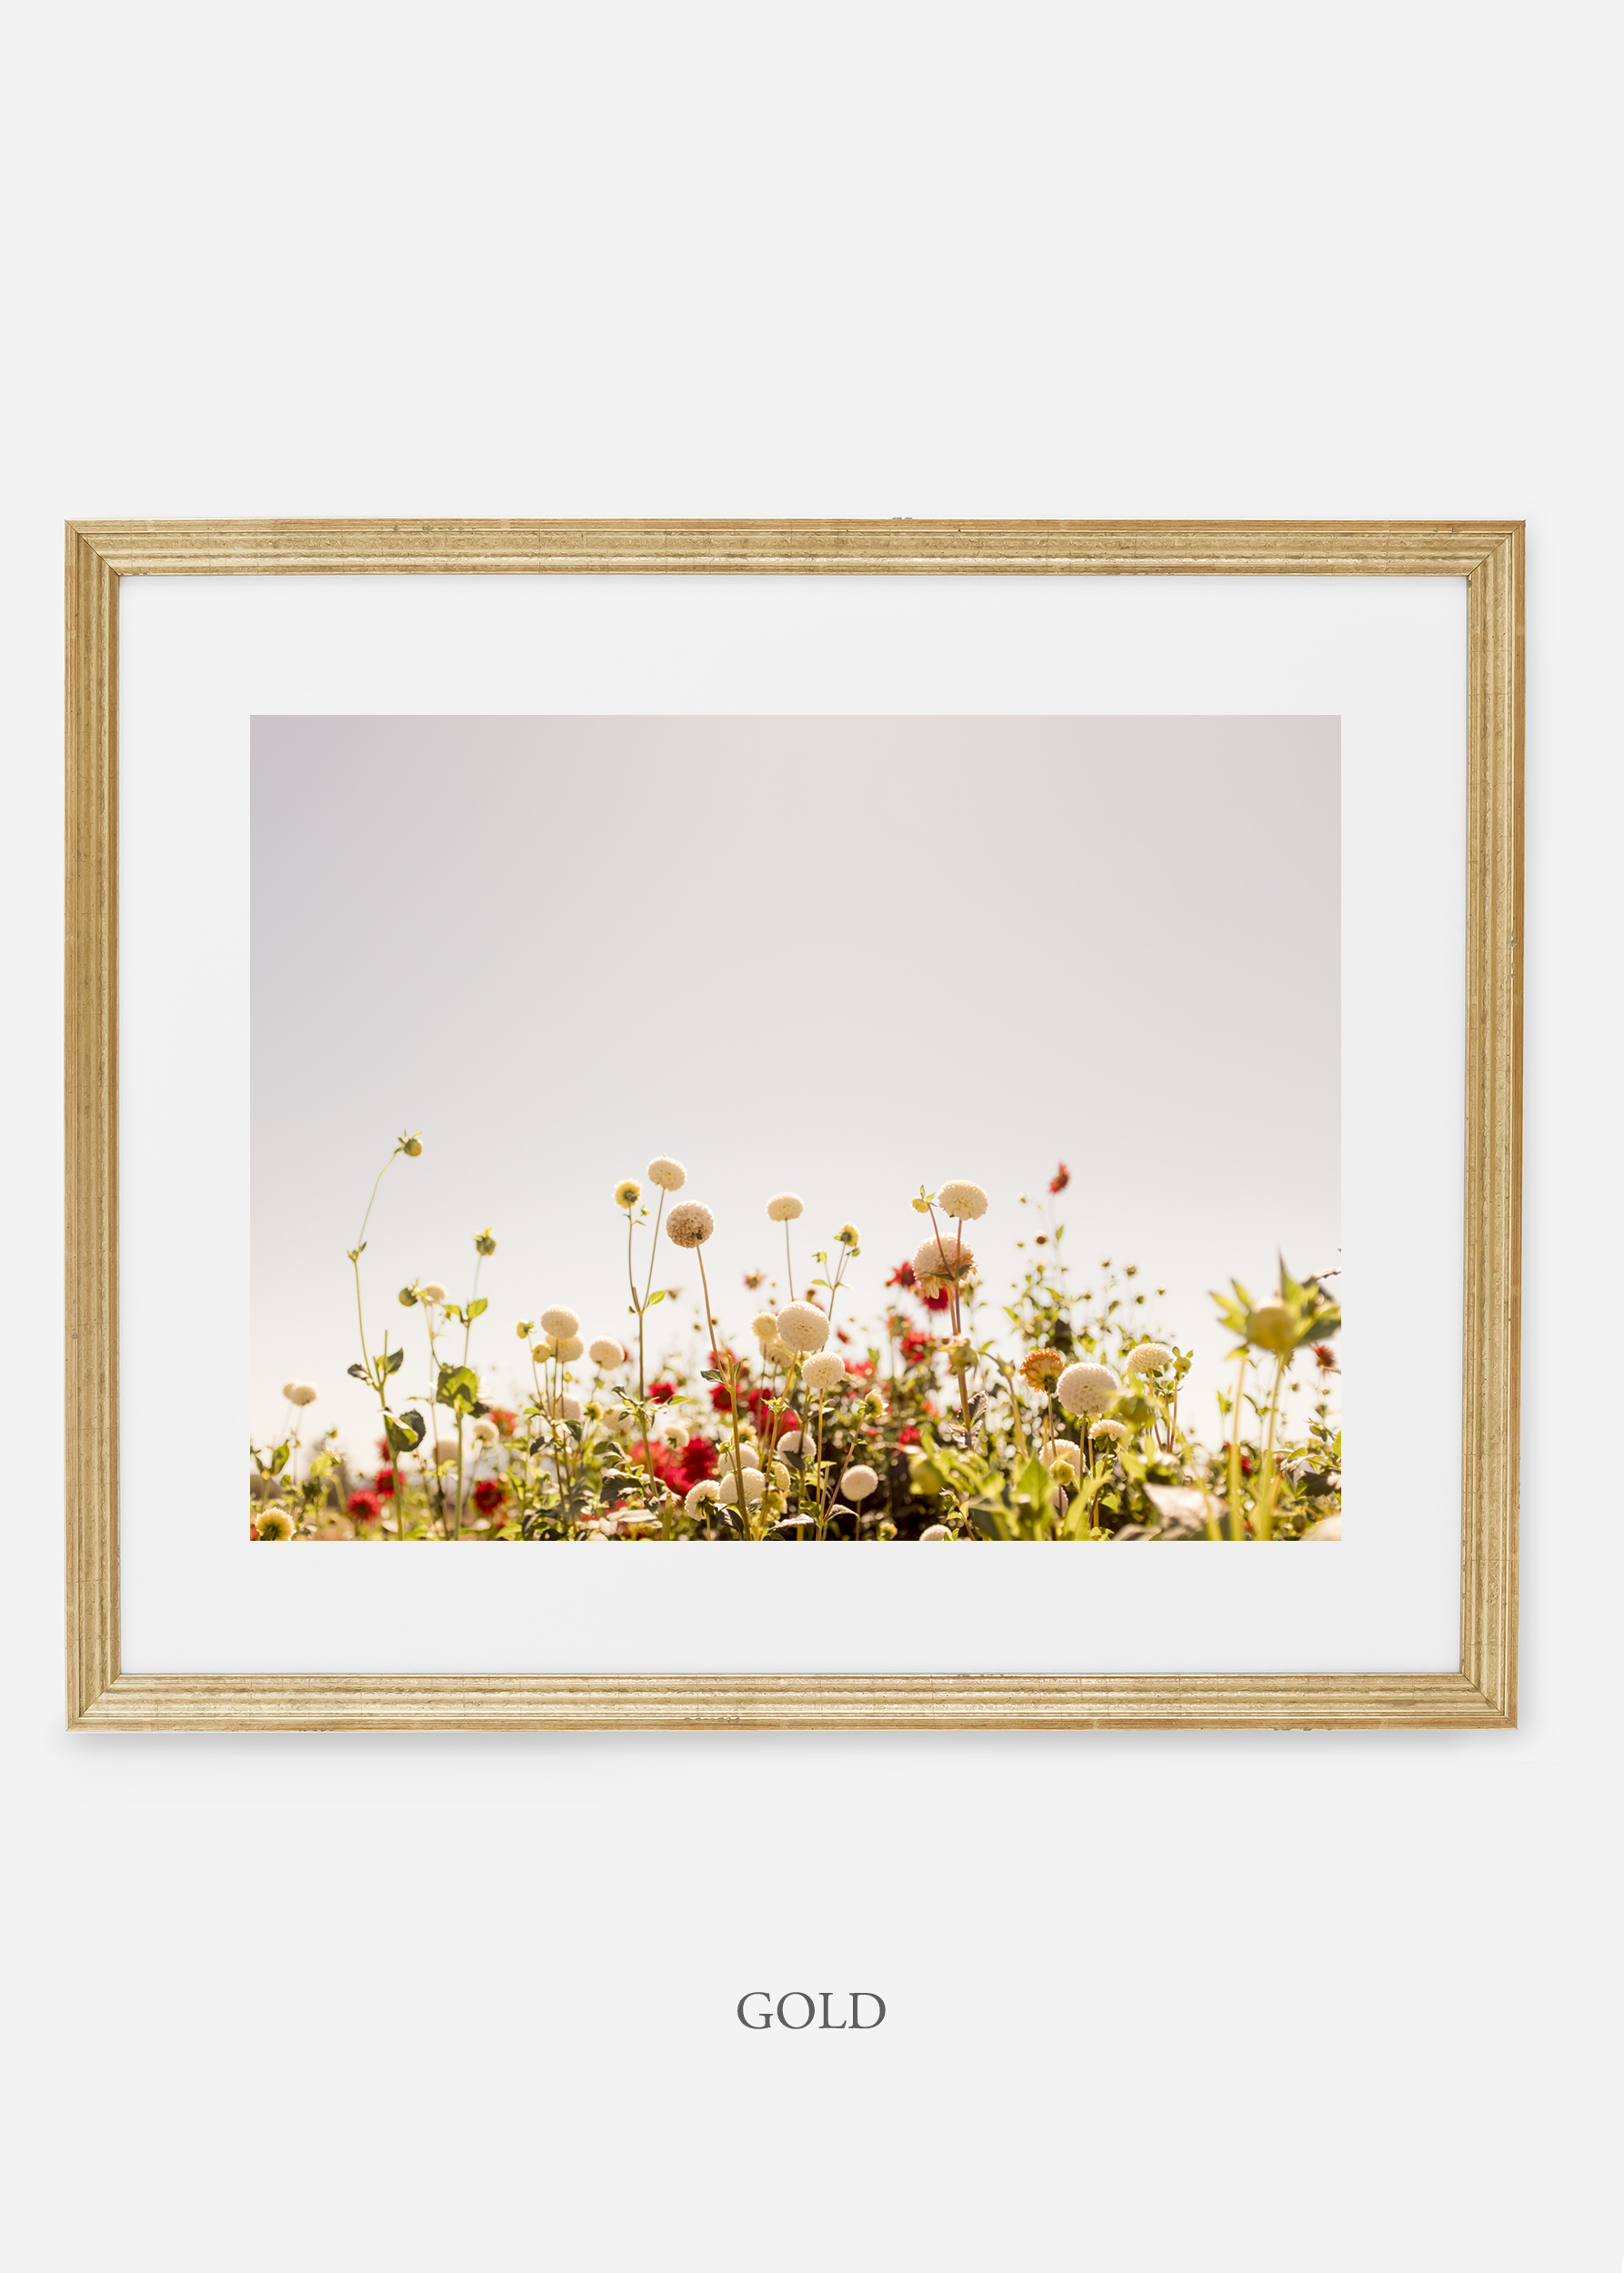 GoldFrame_DahliaNo.5_WilderCalifornia_Art_Floral_Homedecor_Prints_Dahlia_Botanical_Artwork_Interiordesign.jpg